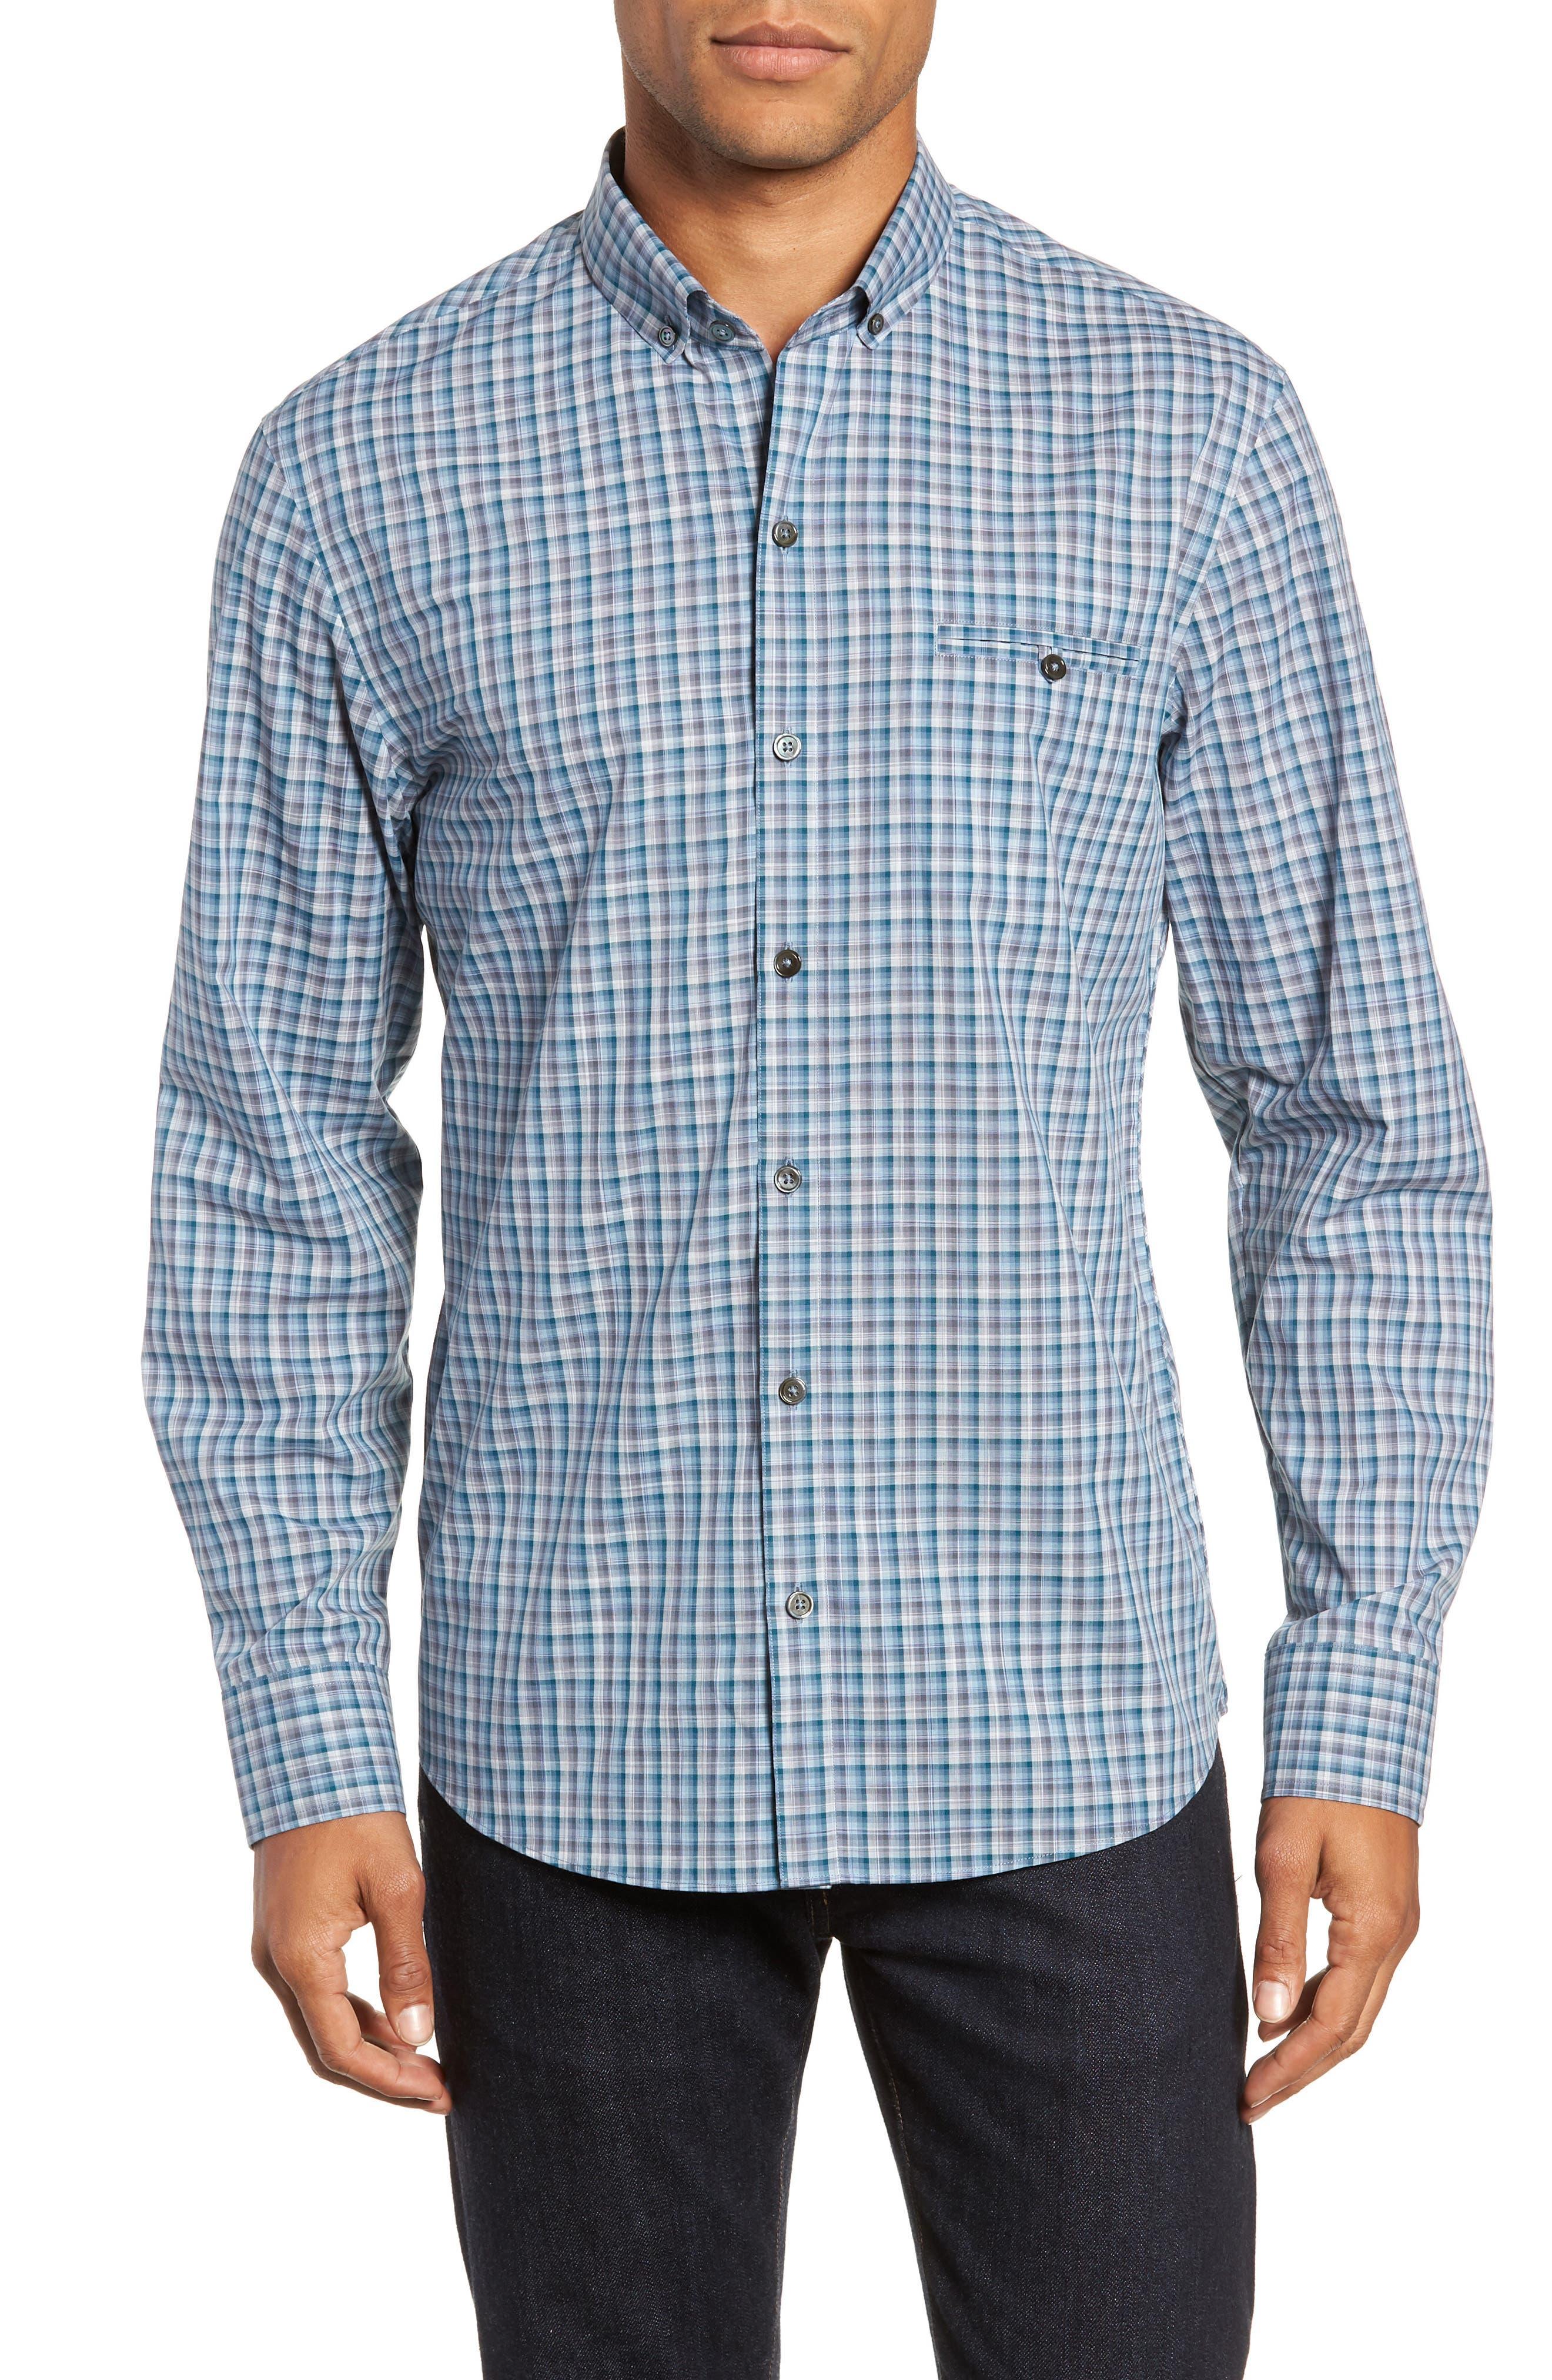 ZACHARY PRELL, Godinez Regular Fit Check Sport Shirt, Main thumbnail 1, color, 475